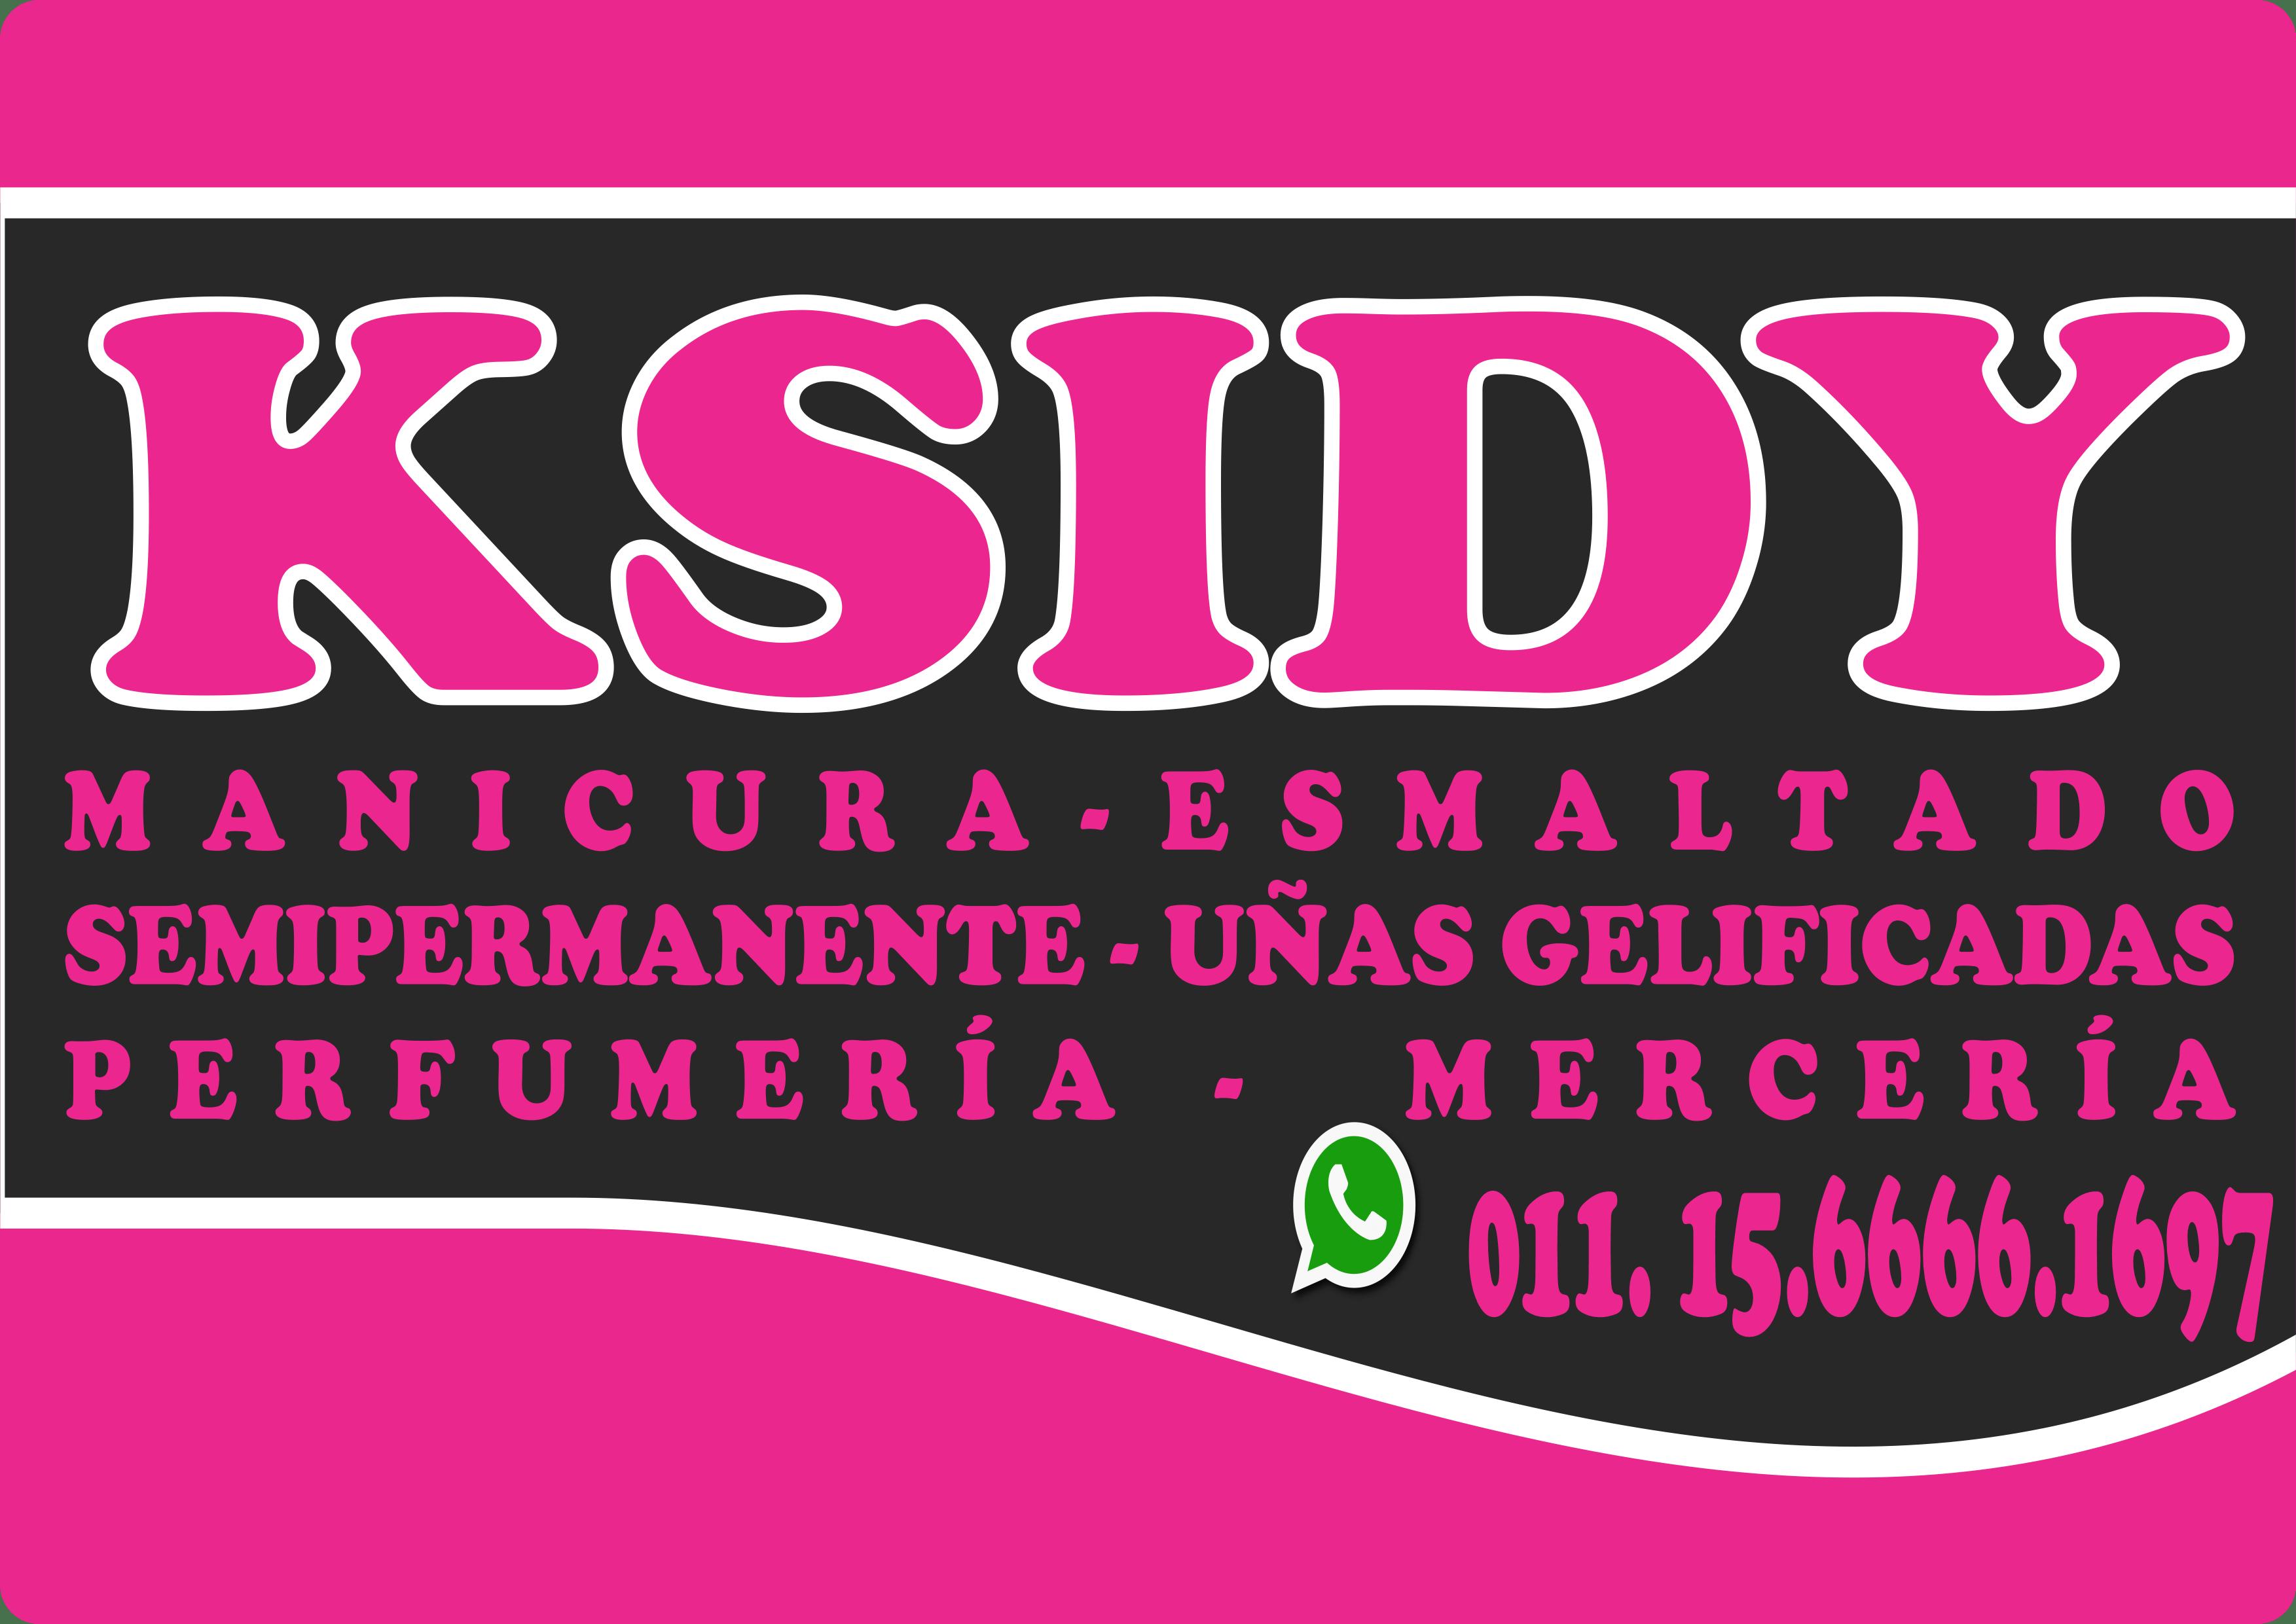 Ksidy